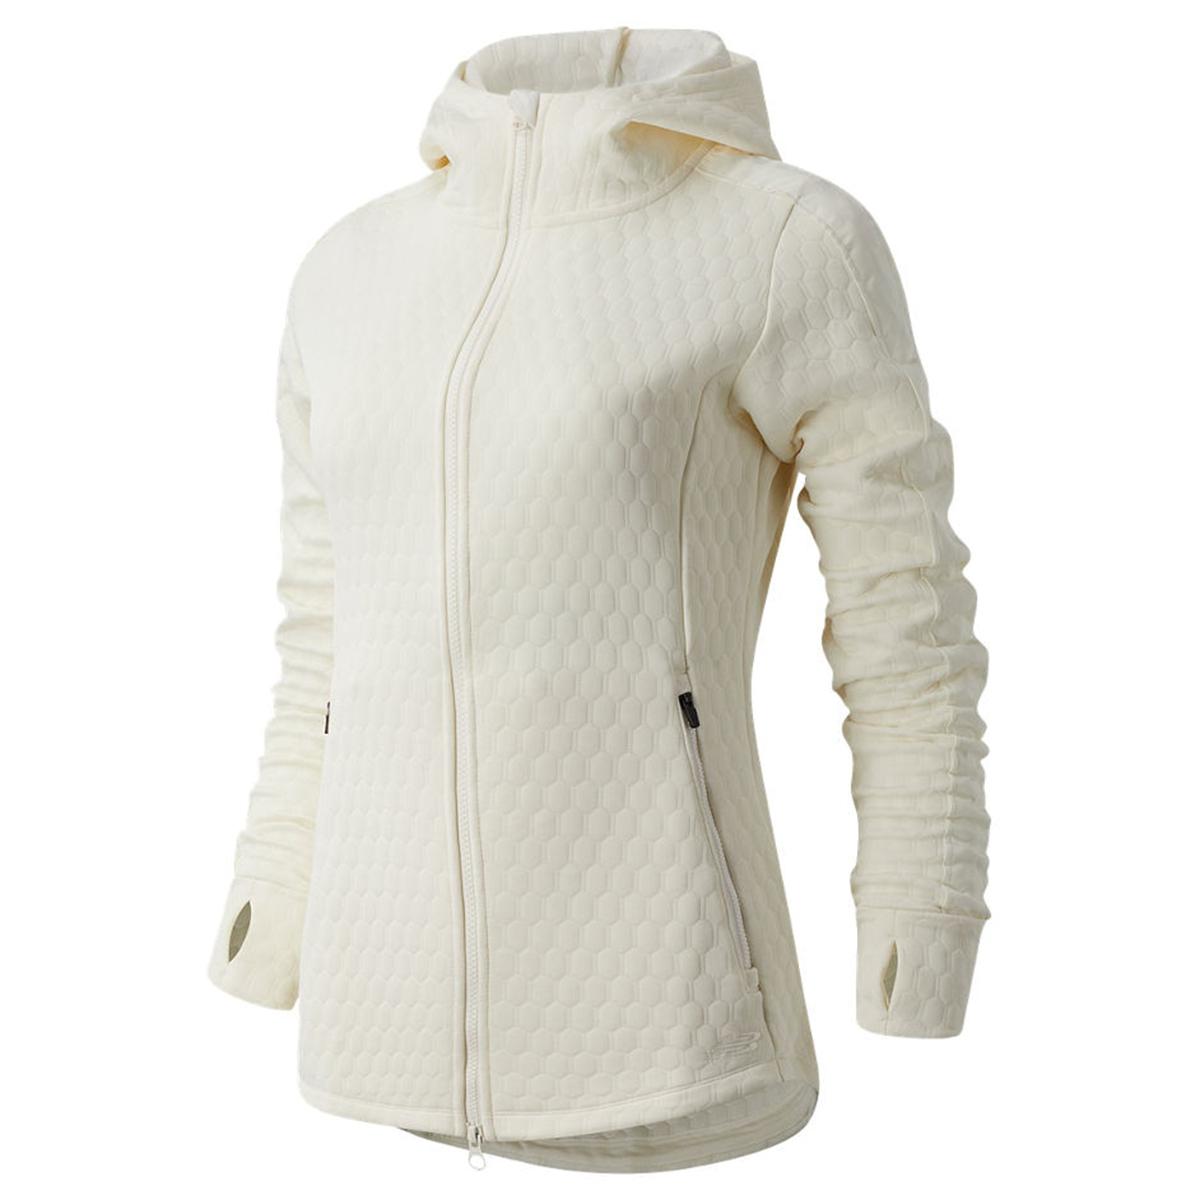 Women's New Balance HeatLoft Jacket - Color: Sea Salt Heather - Size: L, Sea Salt Heather, large, image 1